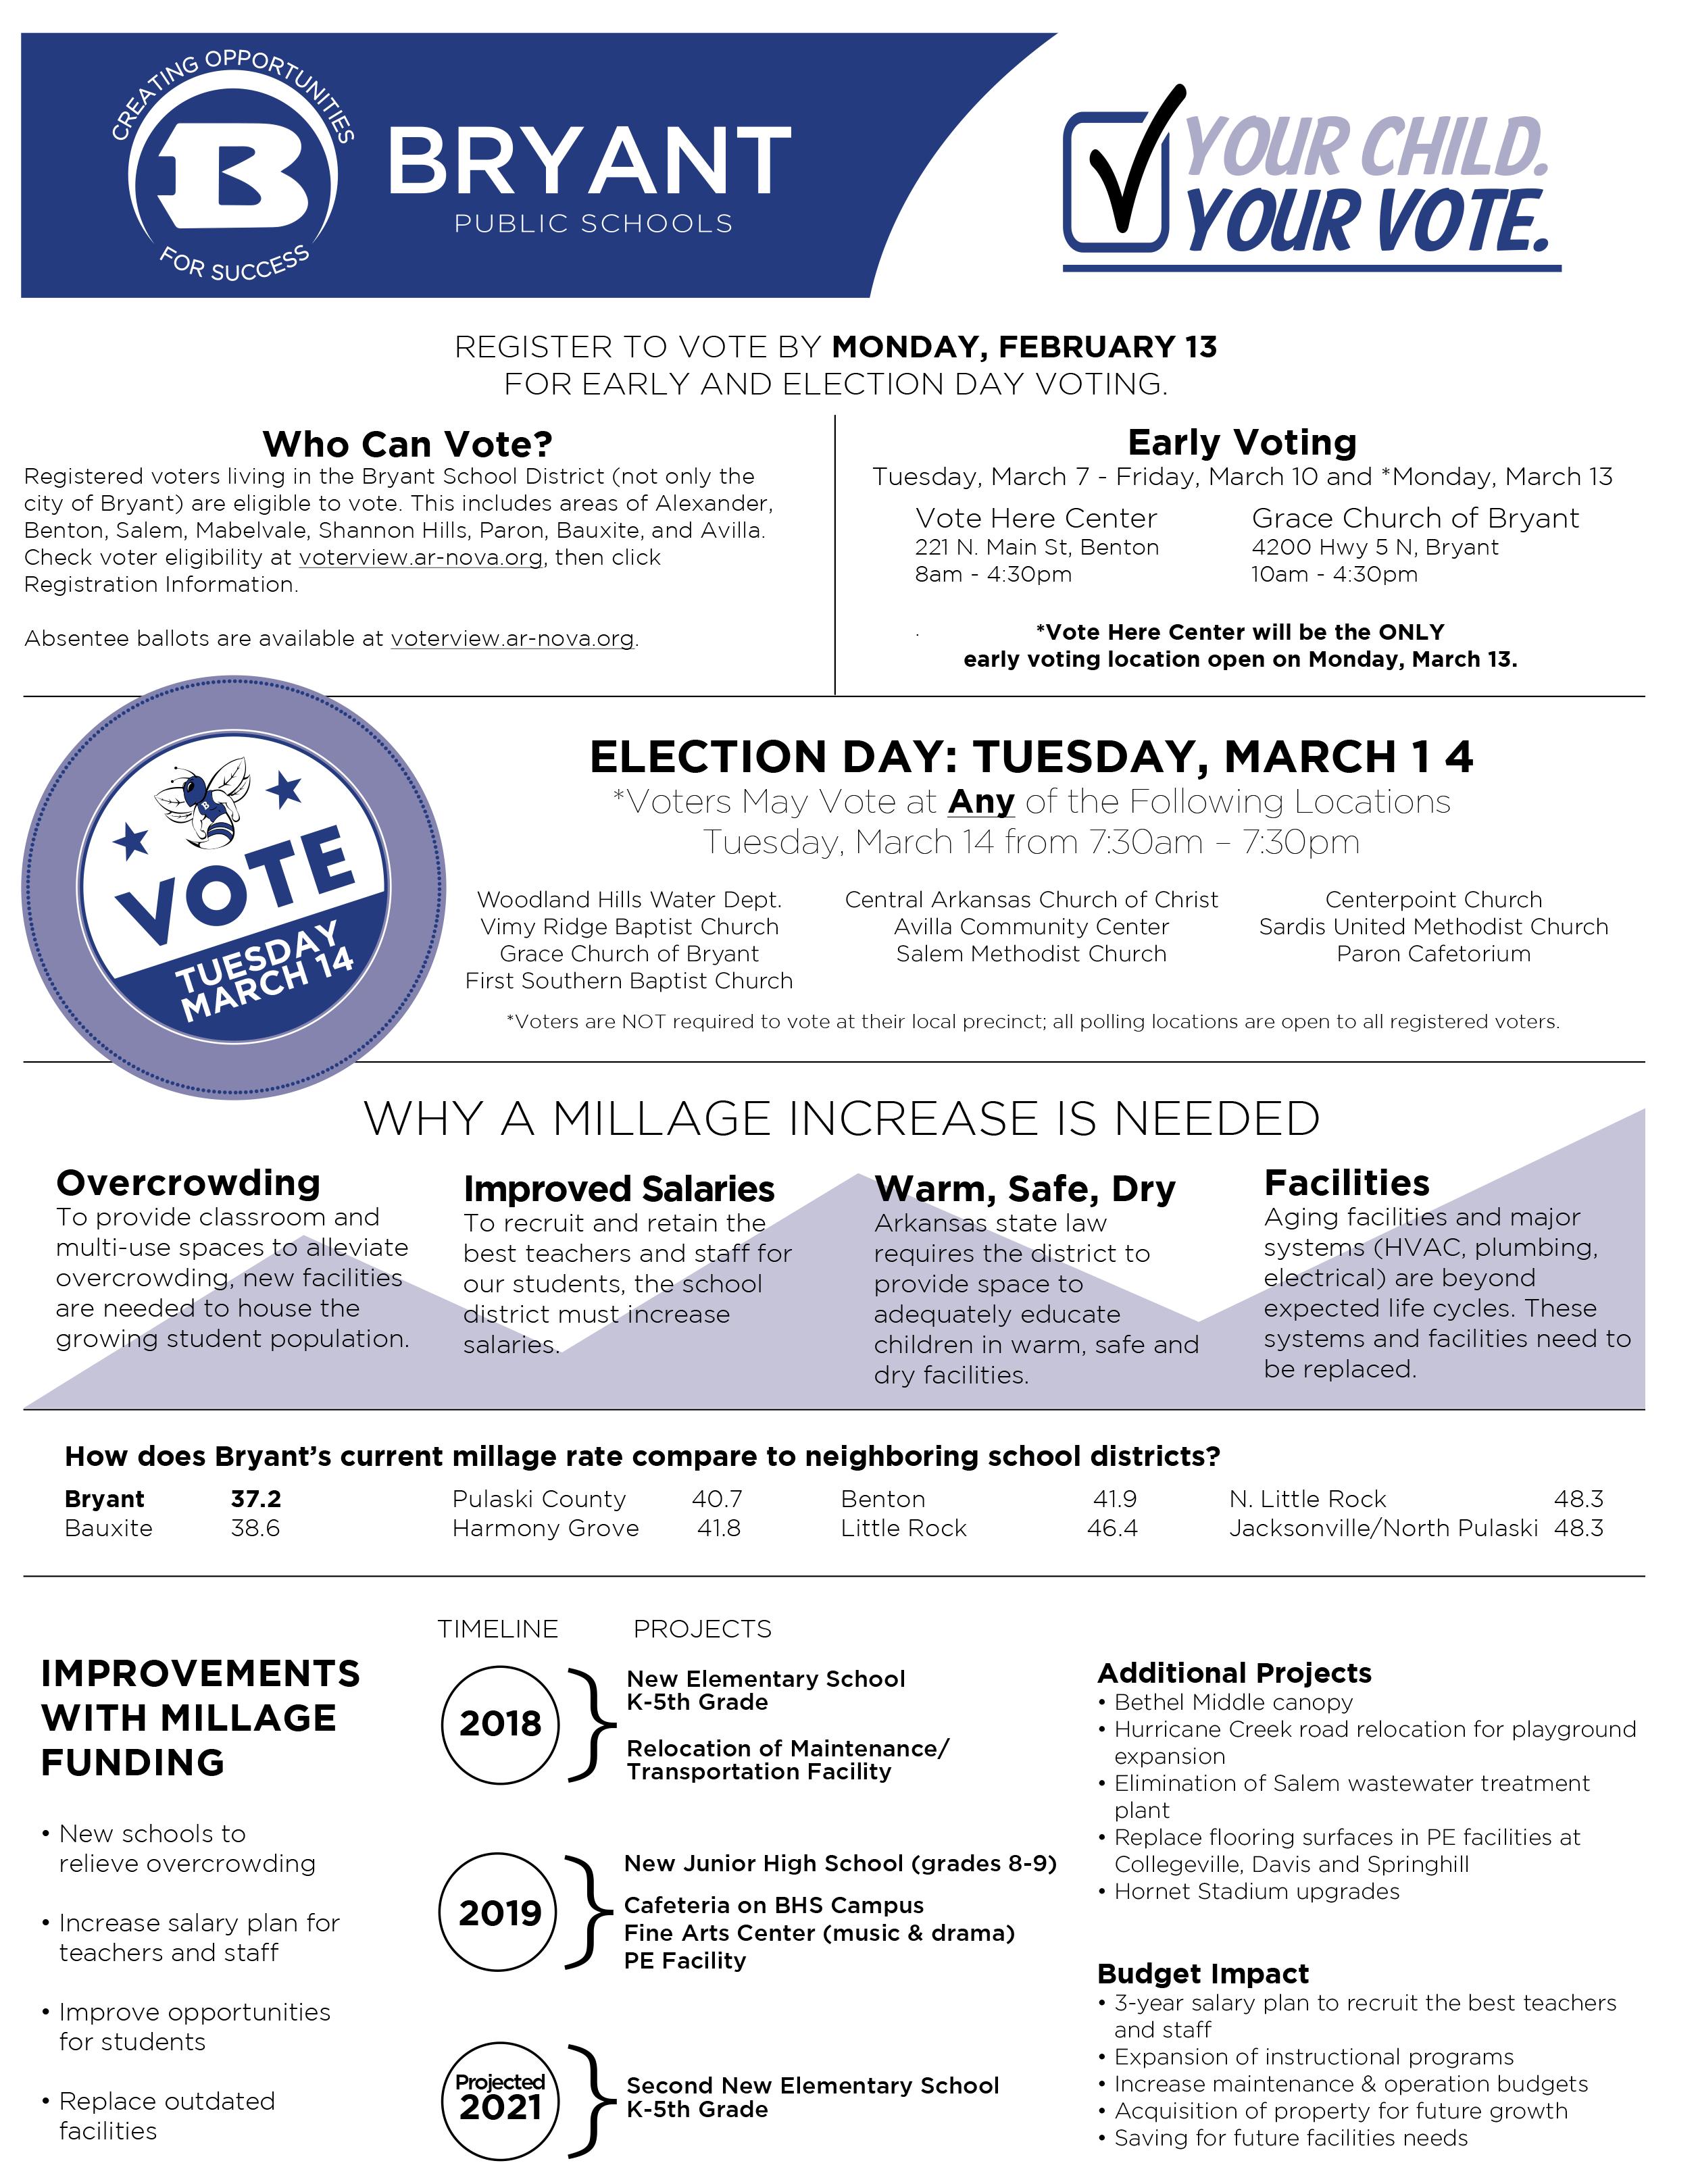 bryant millage voter info flyer 1